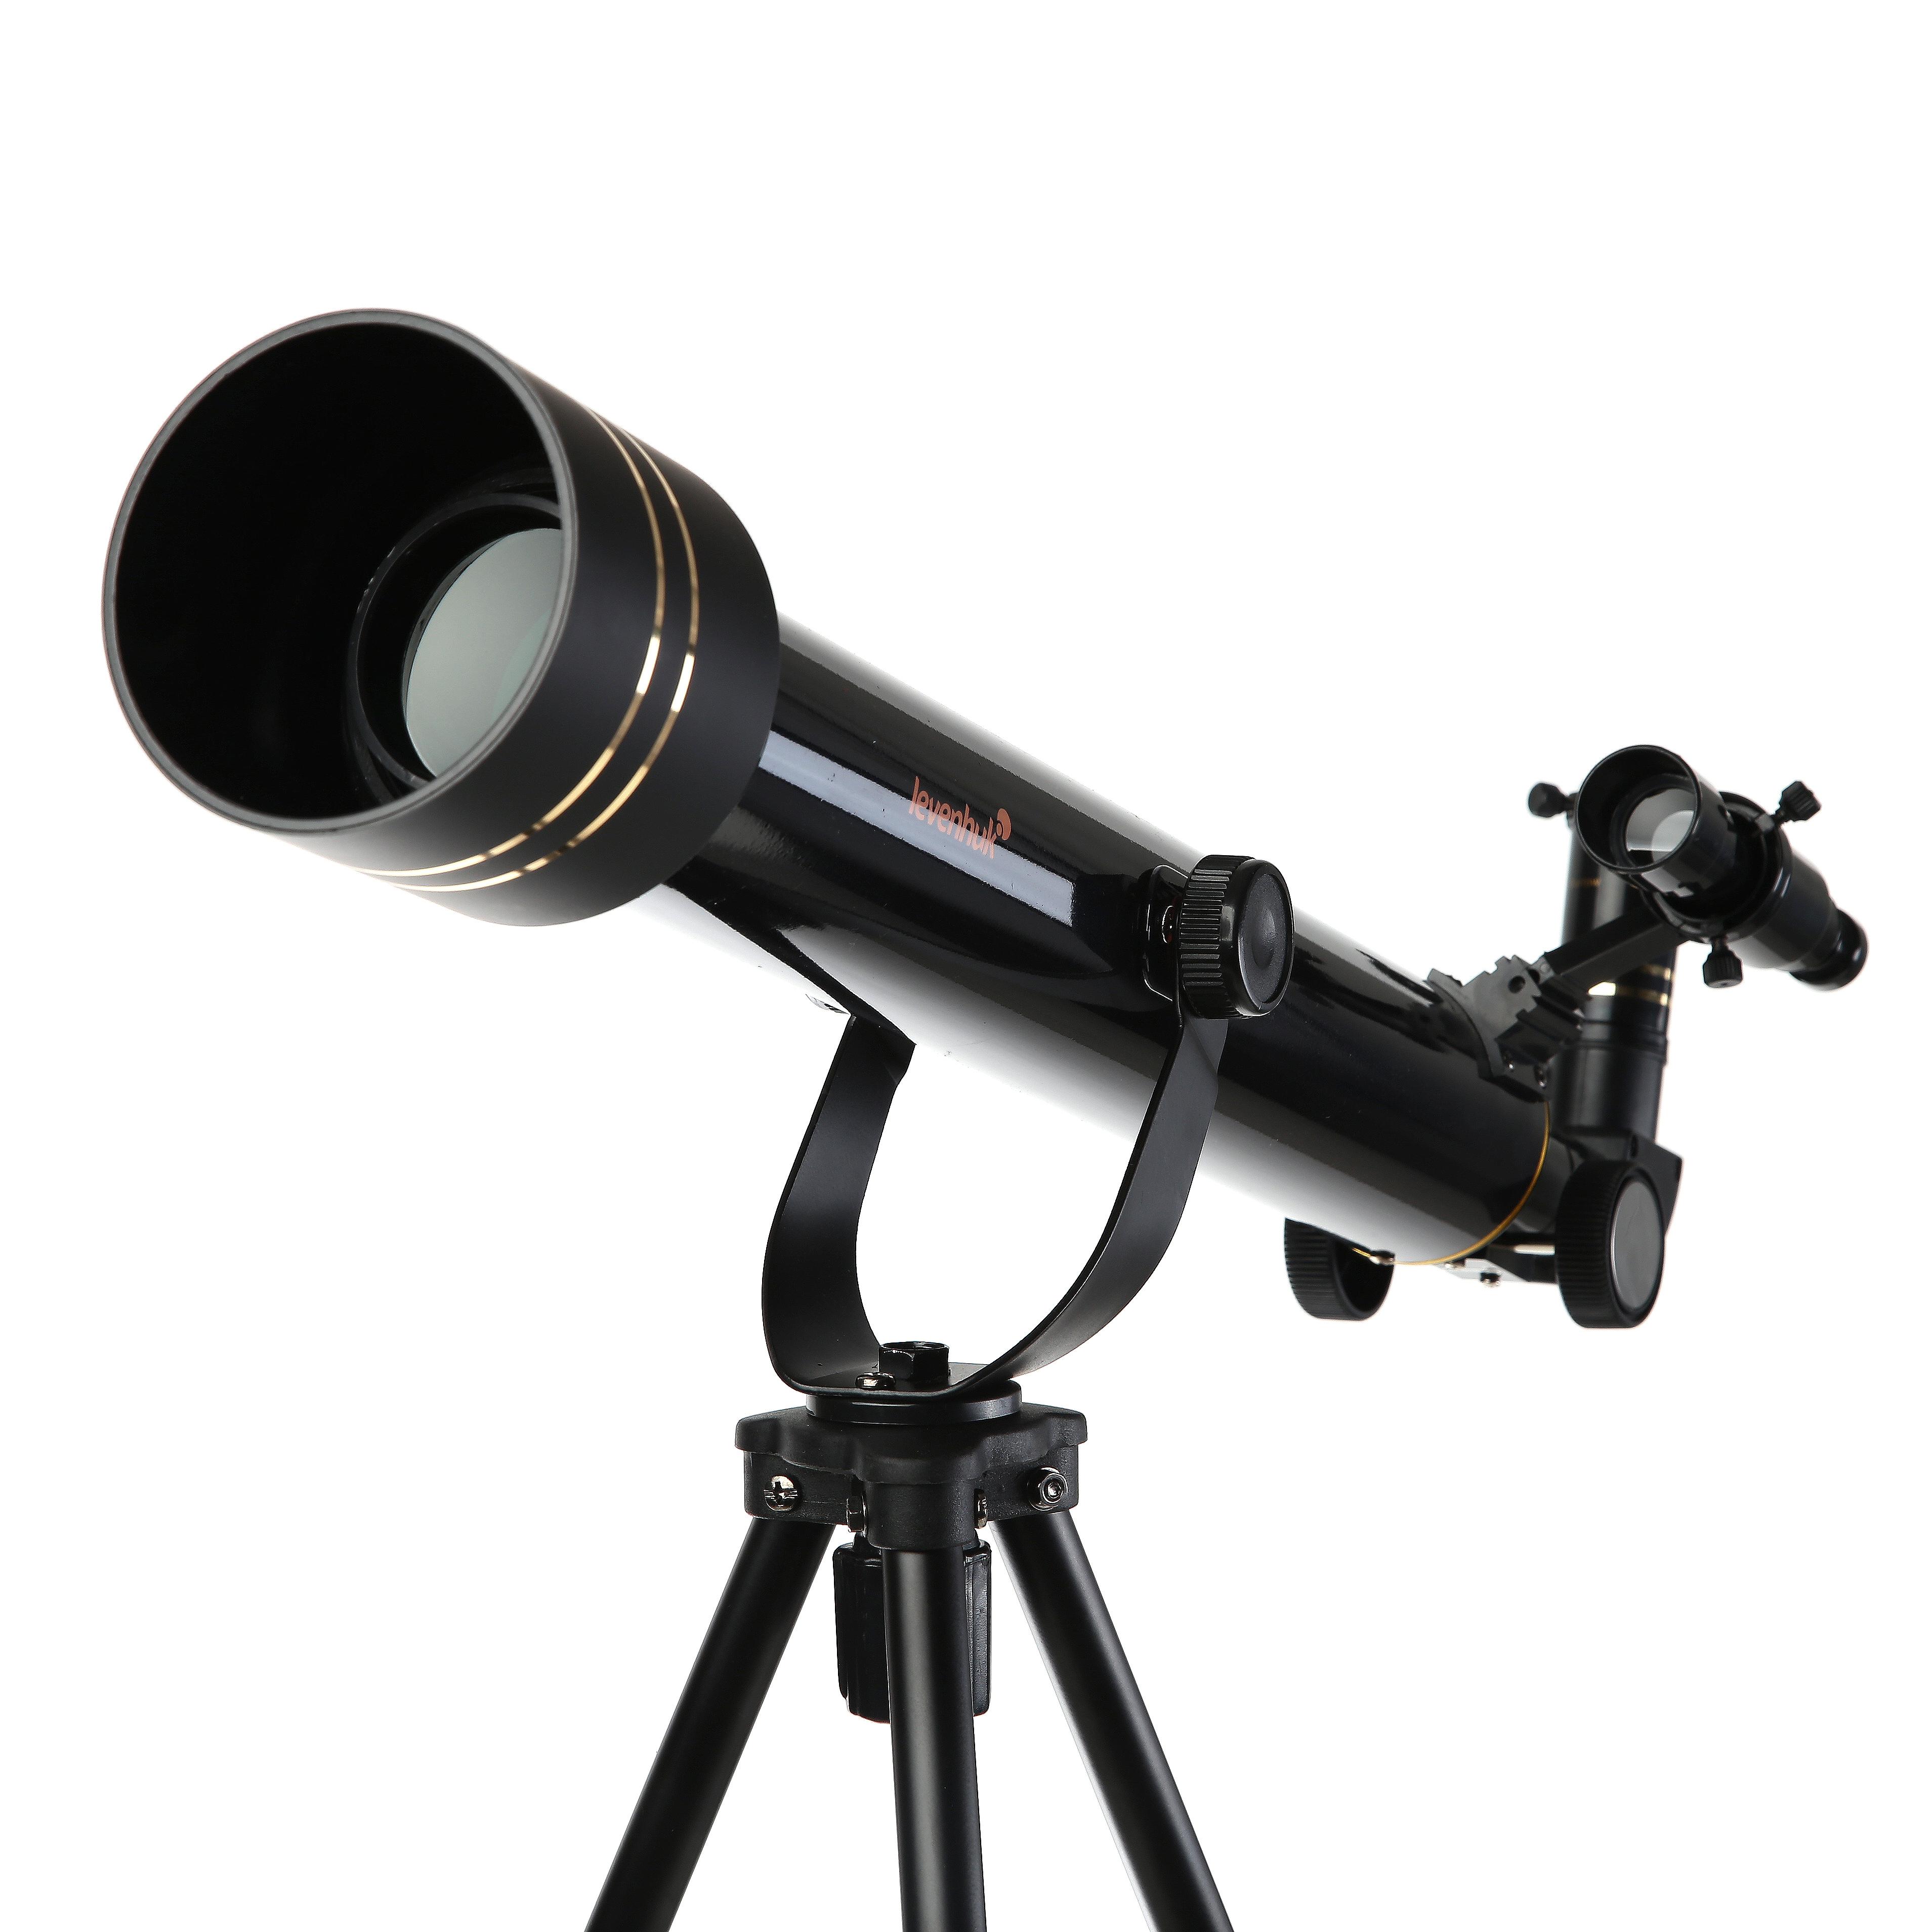 Телескоп Levenhuk Strike 50 ng (ru) набор готовых микропрепаратов levenhuk левенгук n10 ng